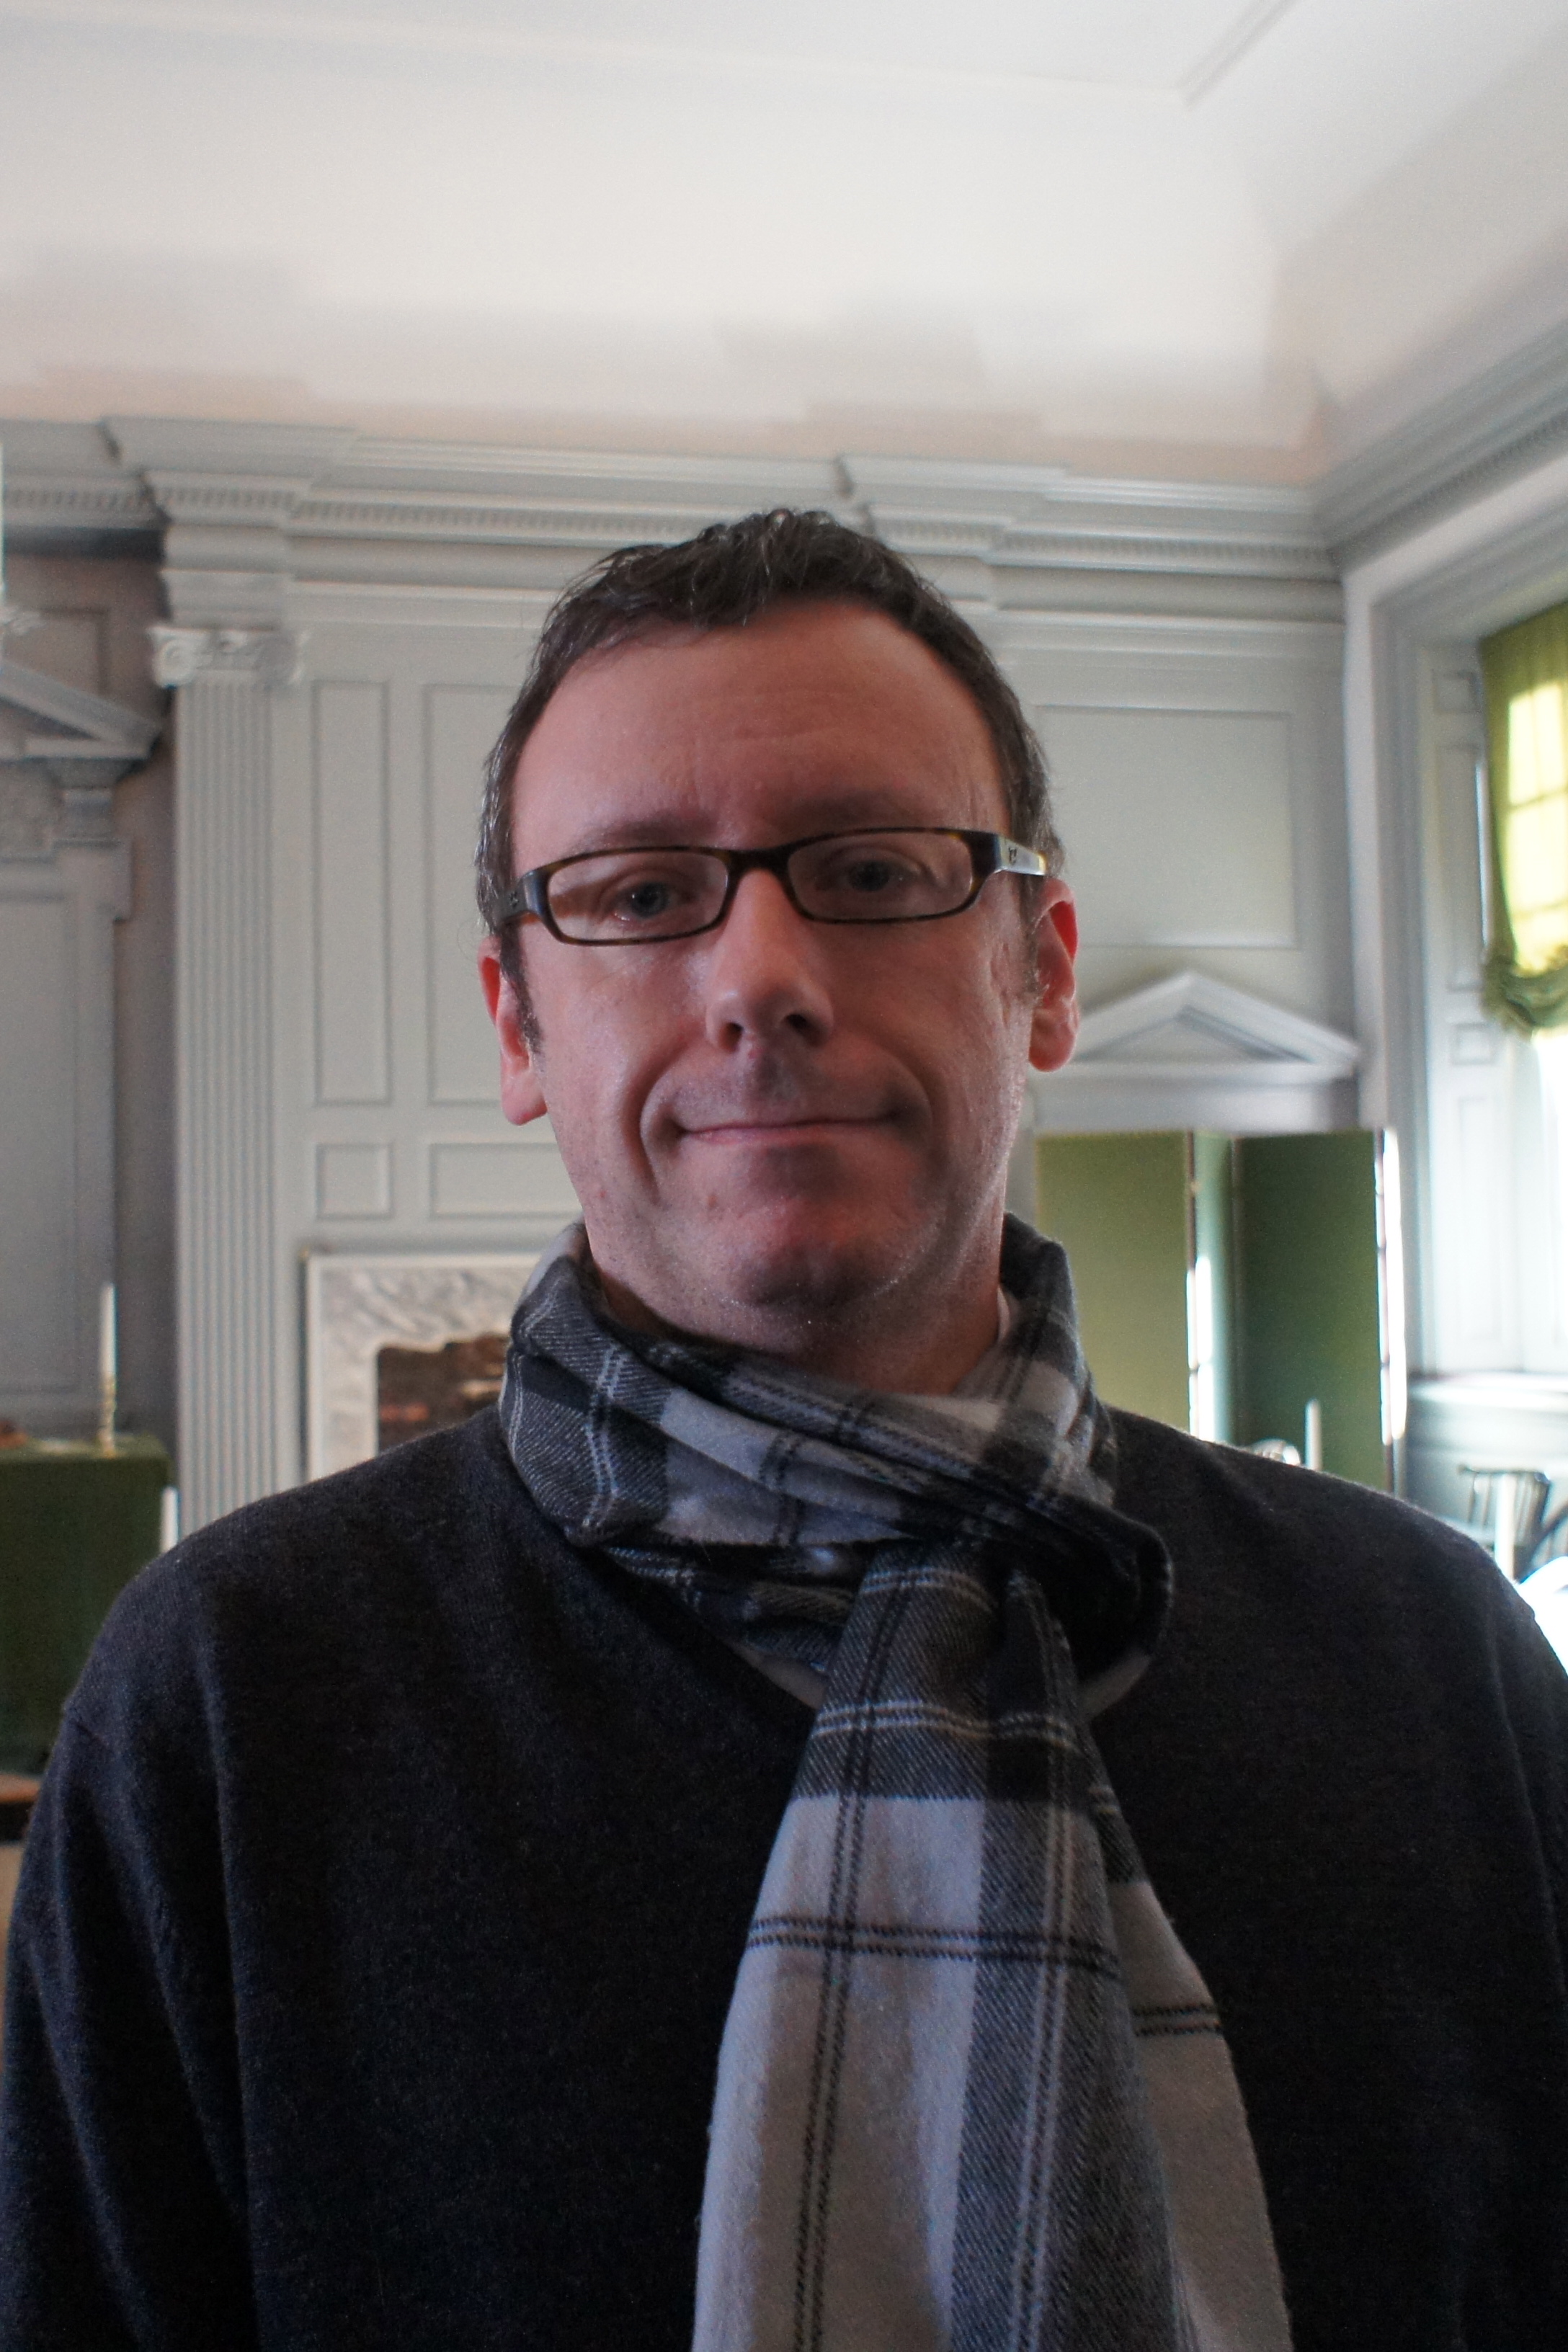 Whitta in 28 January 2012